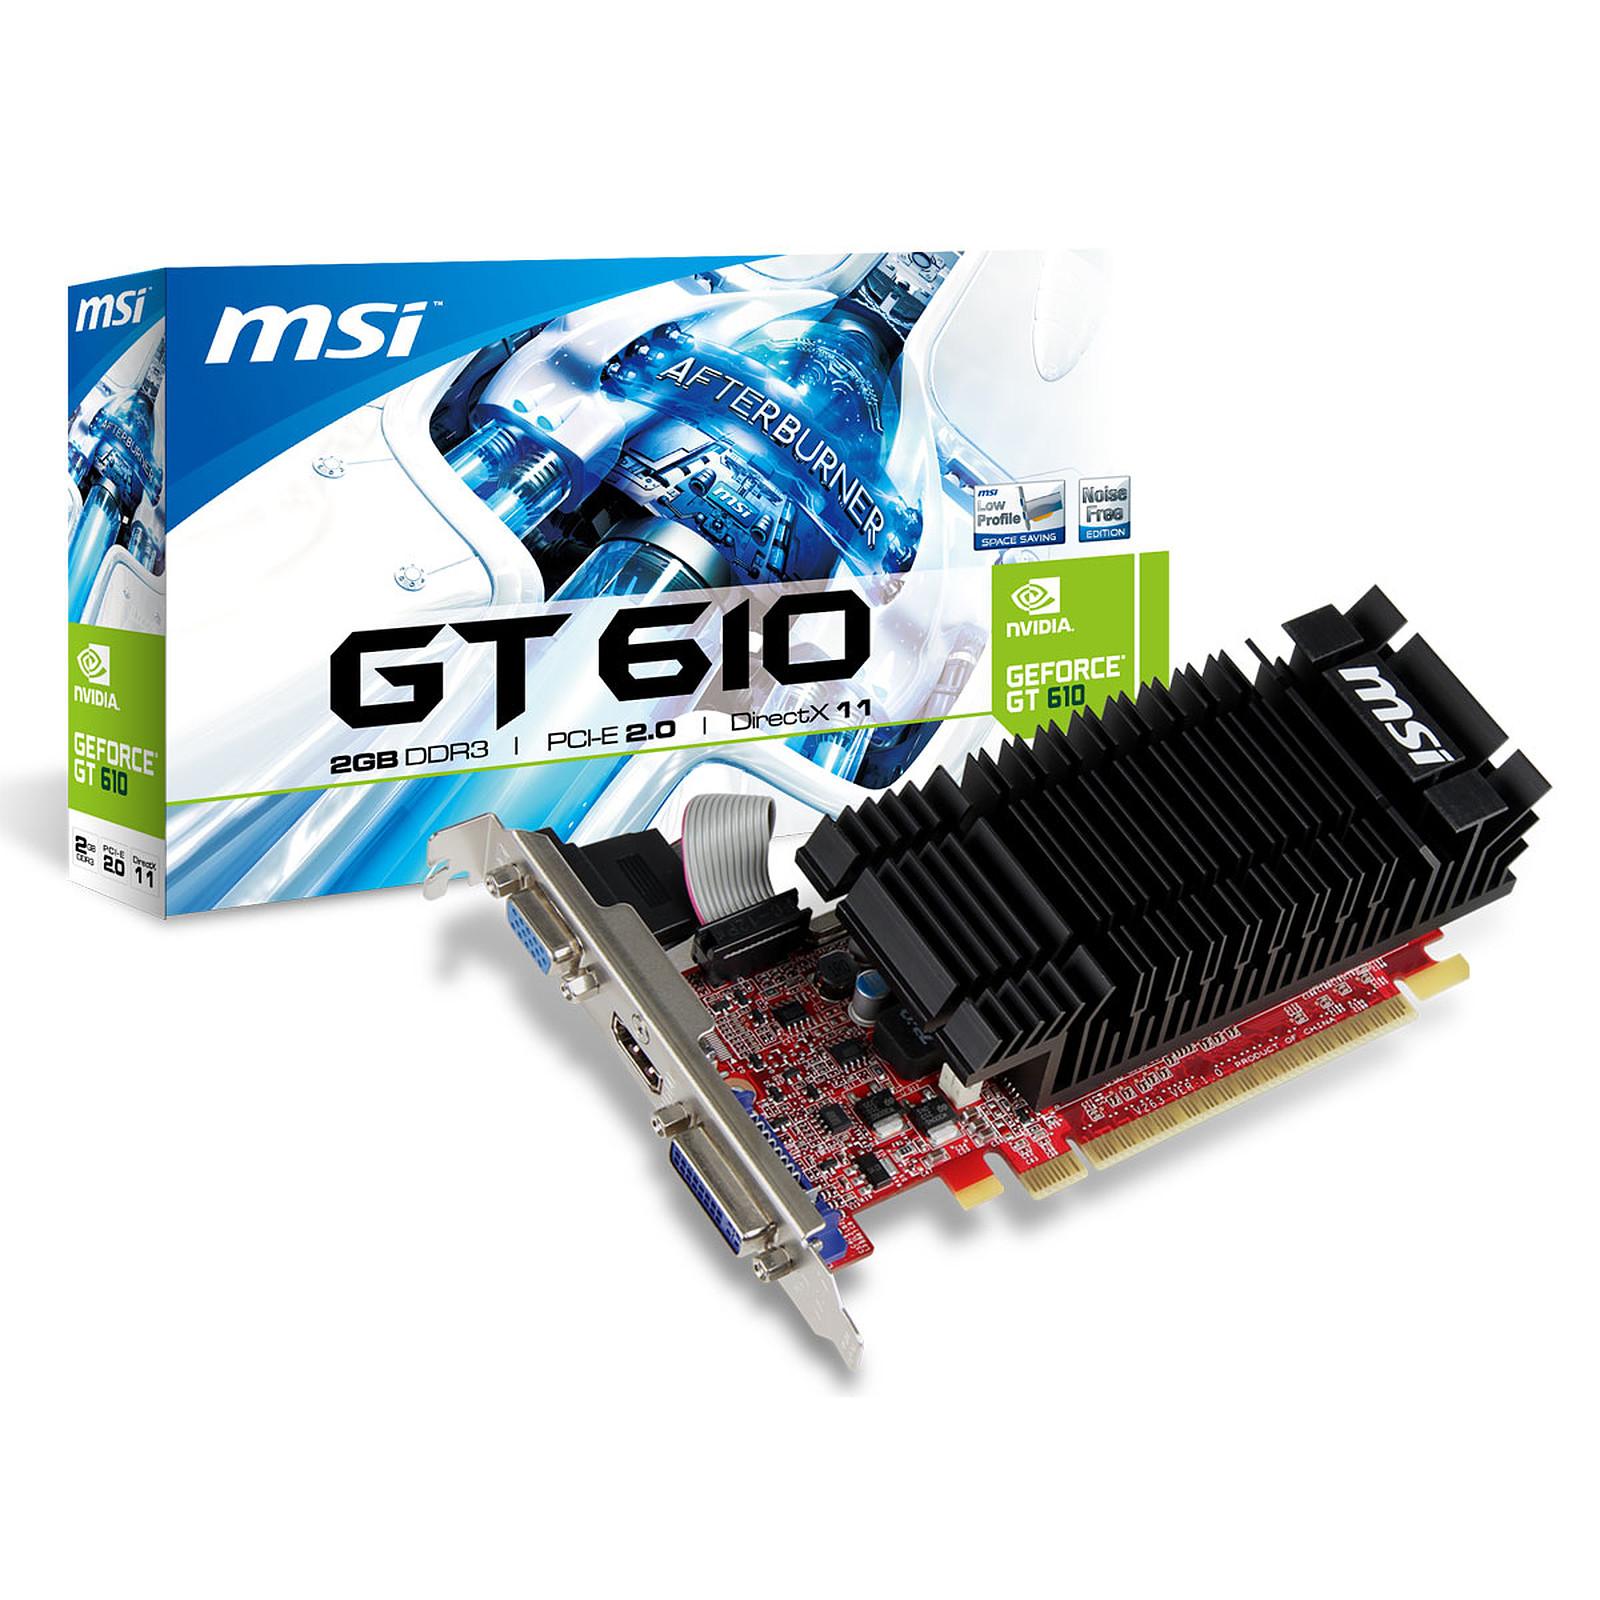 MSI N610-2GD3H/LP 2 GB